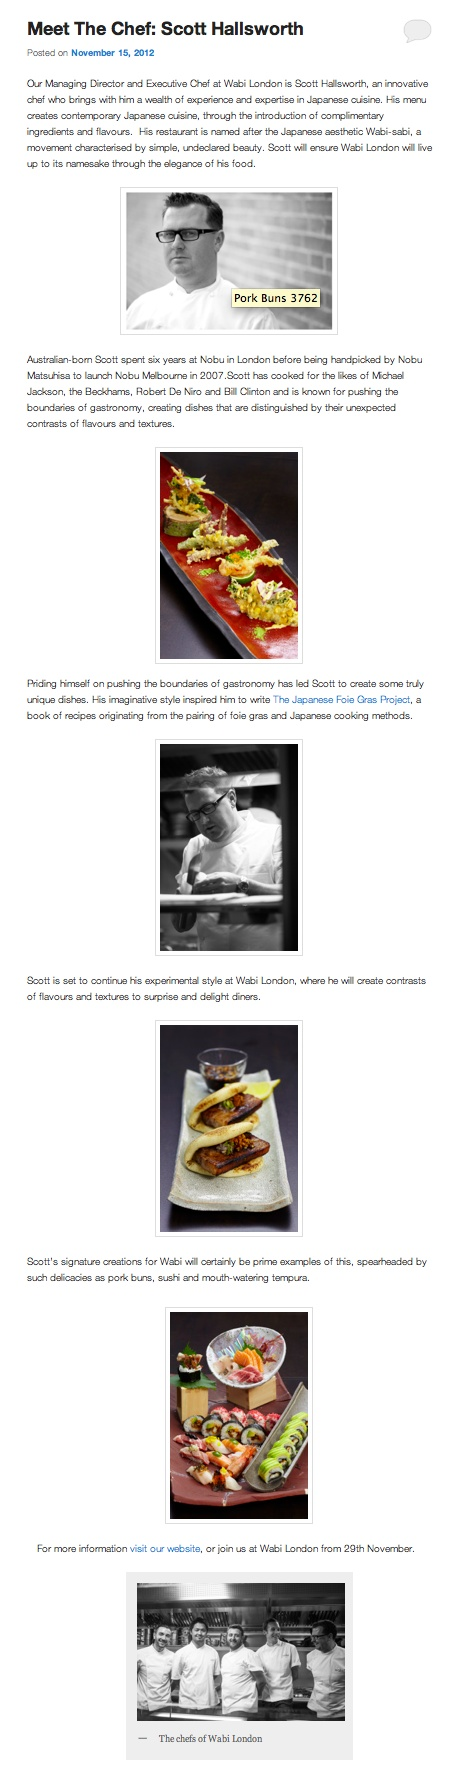 Meet The Chef: Scott Hallsworth